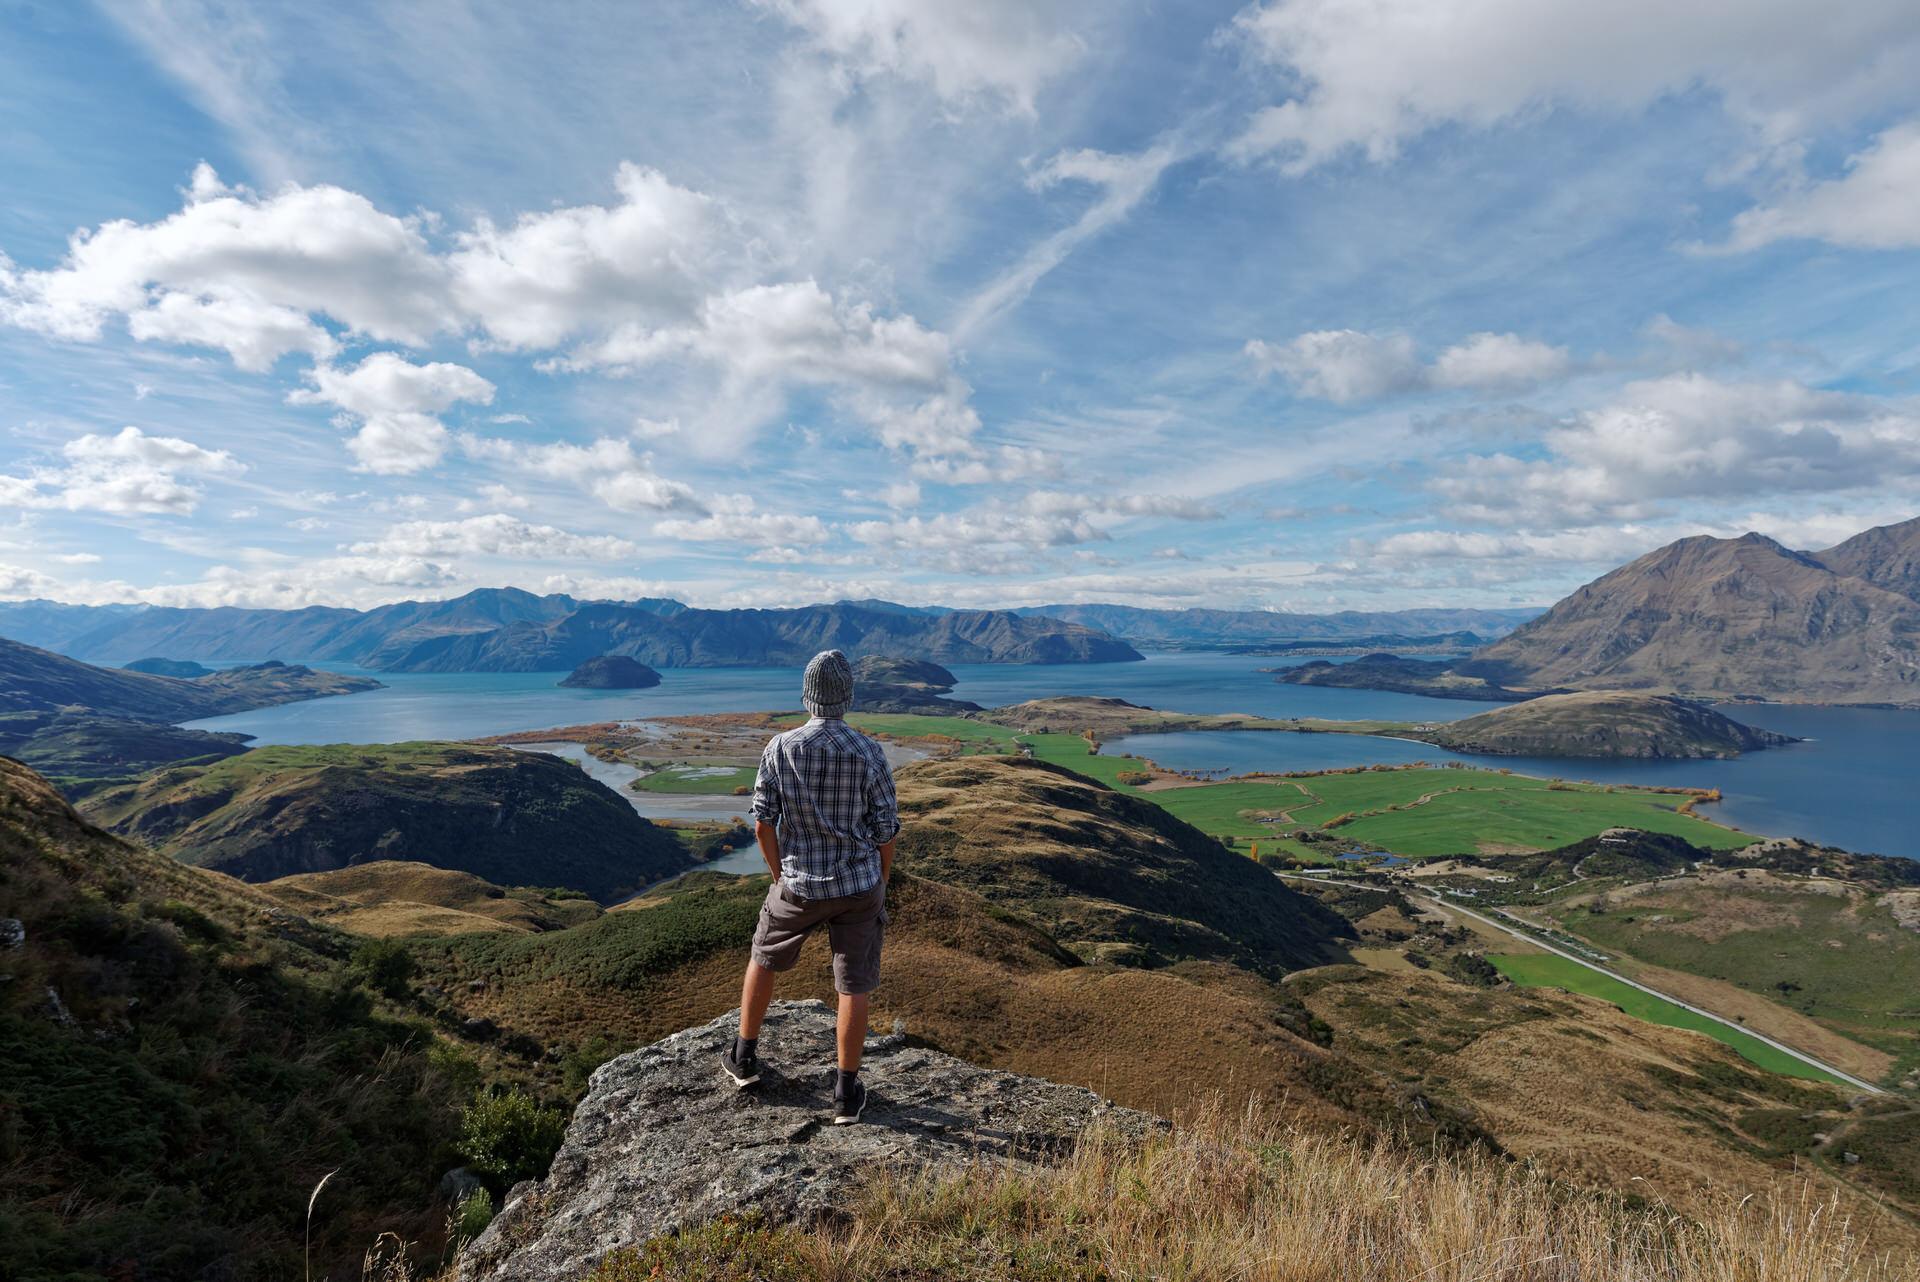 Great Walks Nouvelle-Zélande : Préparation & Organisation